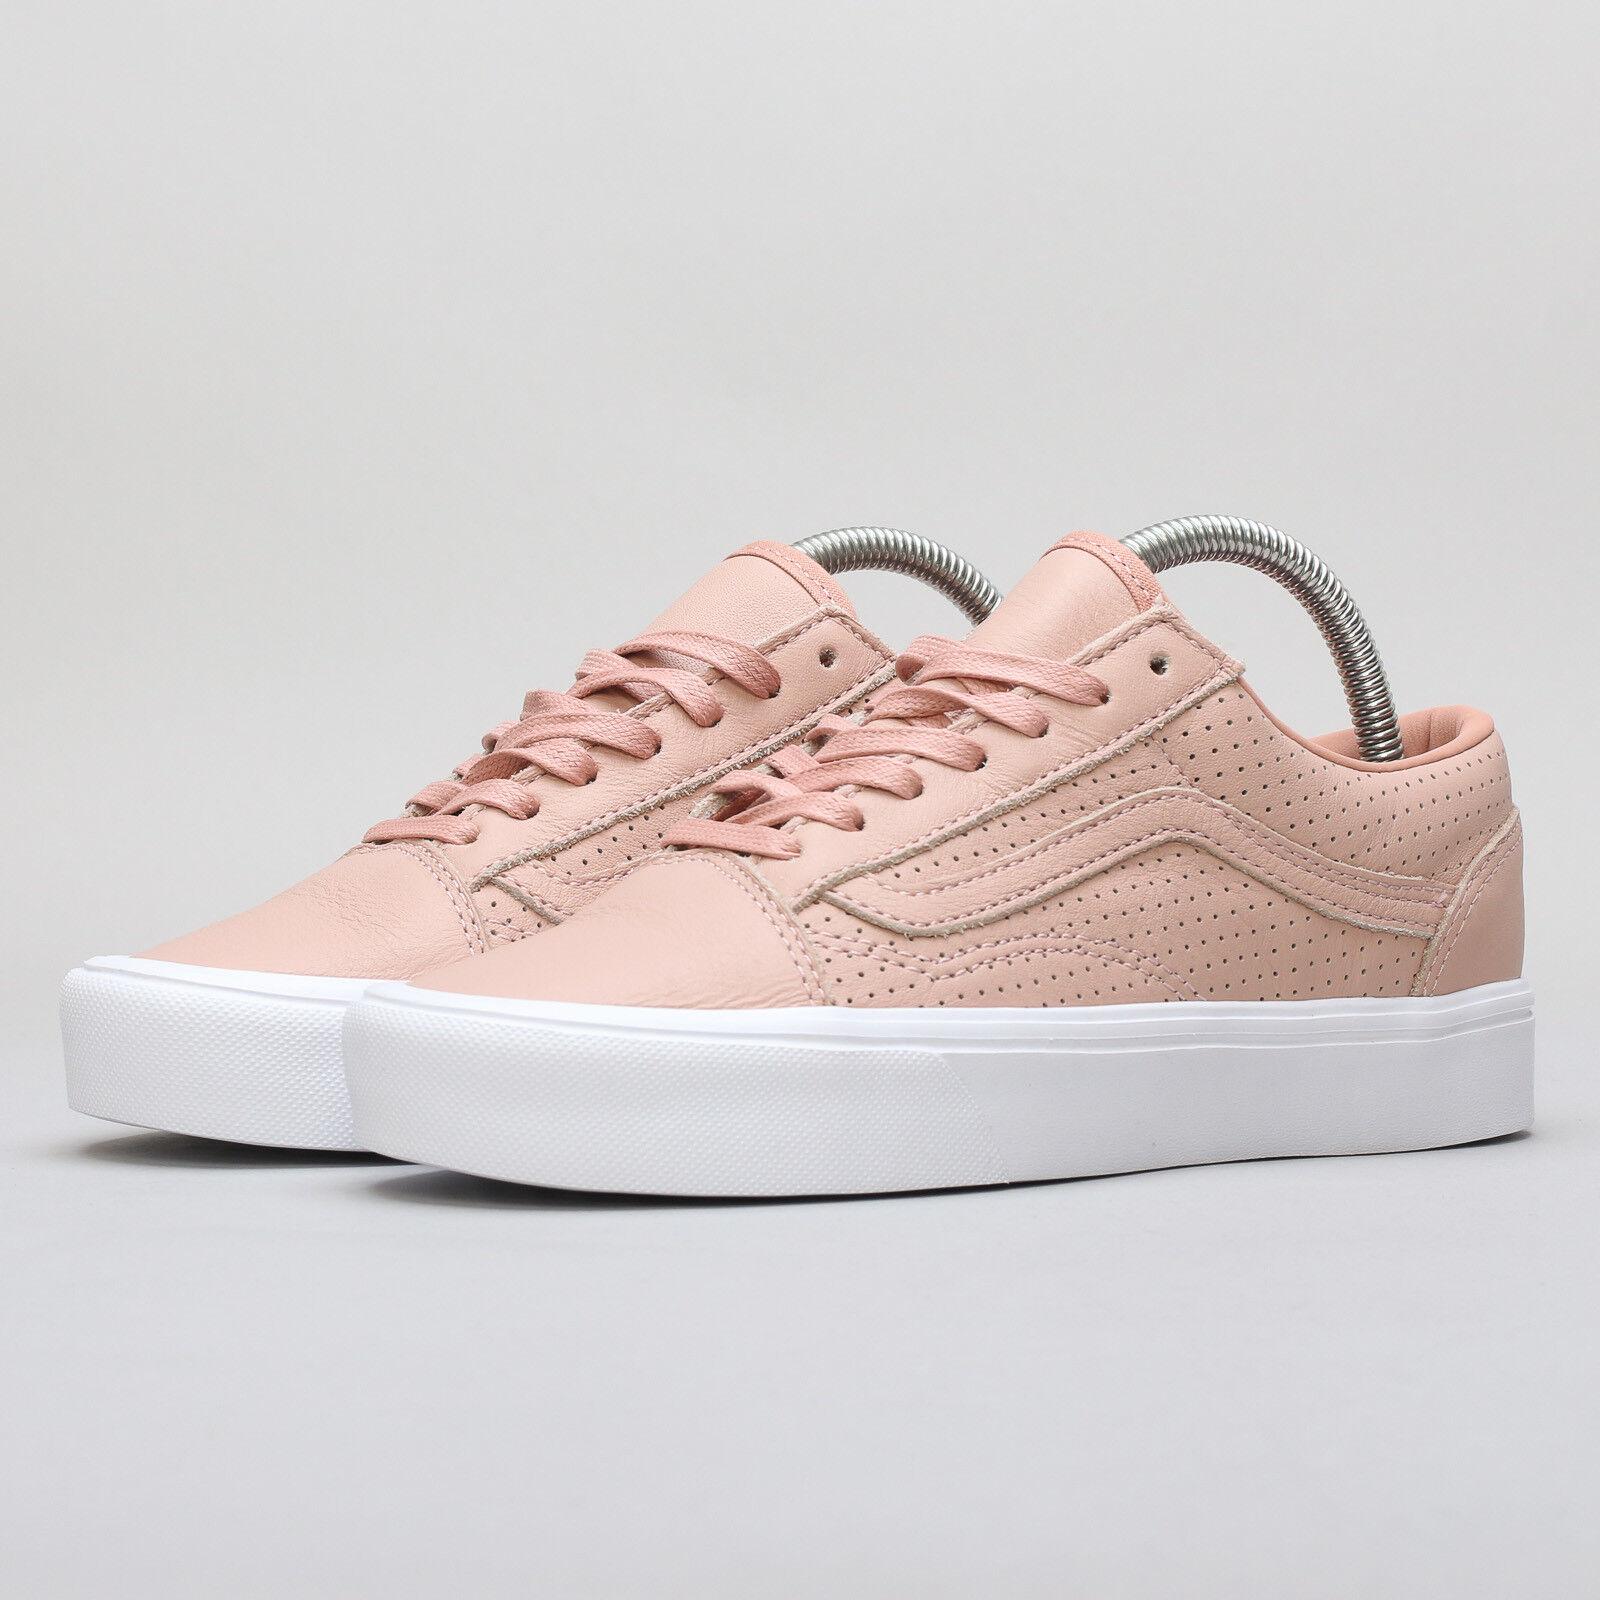 Vans Old Skool Lite (perf) blush EU pink / true wh EU blush 40, Frauen, Pink, VA2Z5WR2D 8ebd30